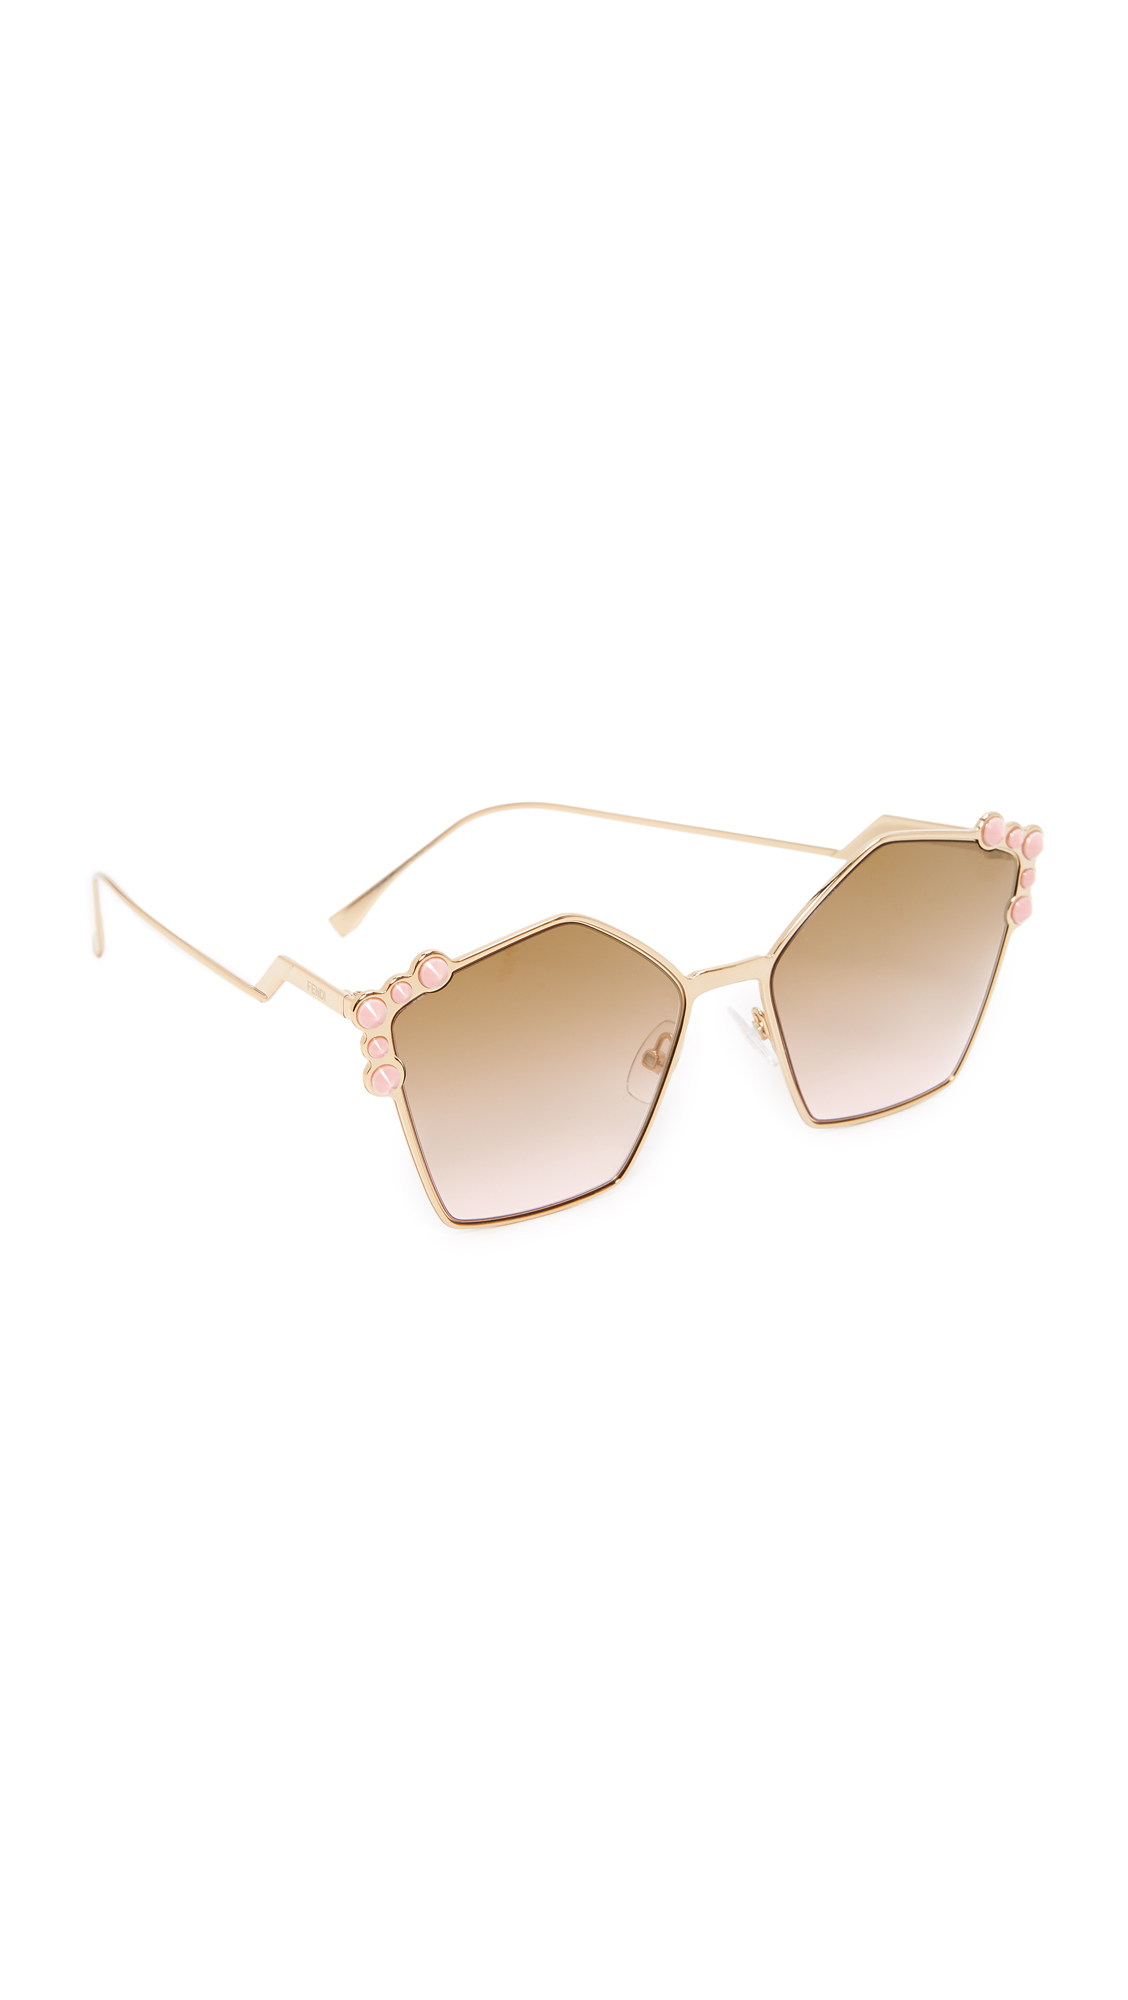 Fendi Geometric Sunglasses - Rose Gold/Brown